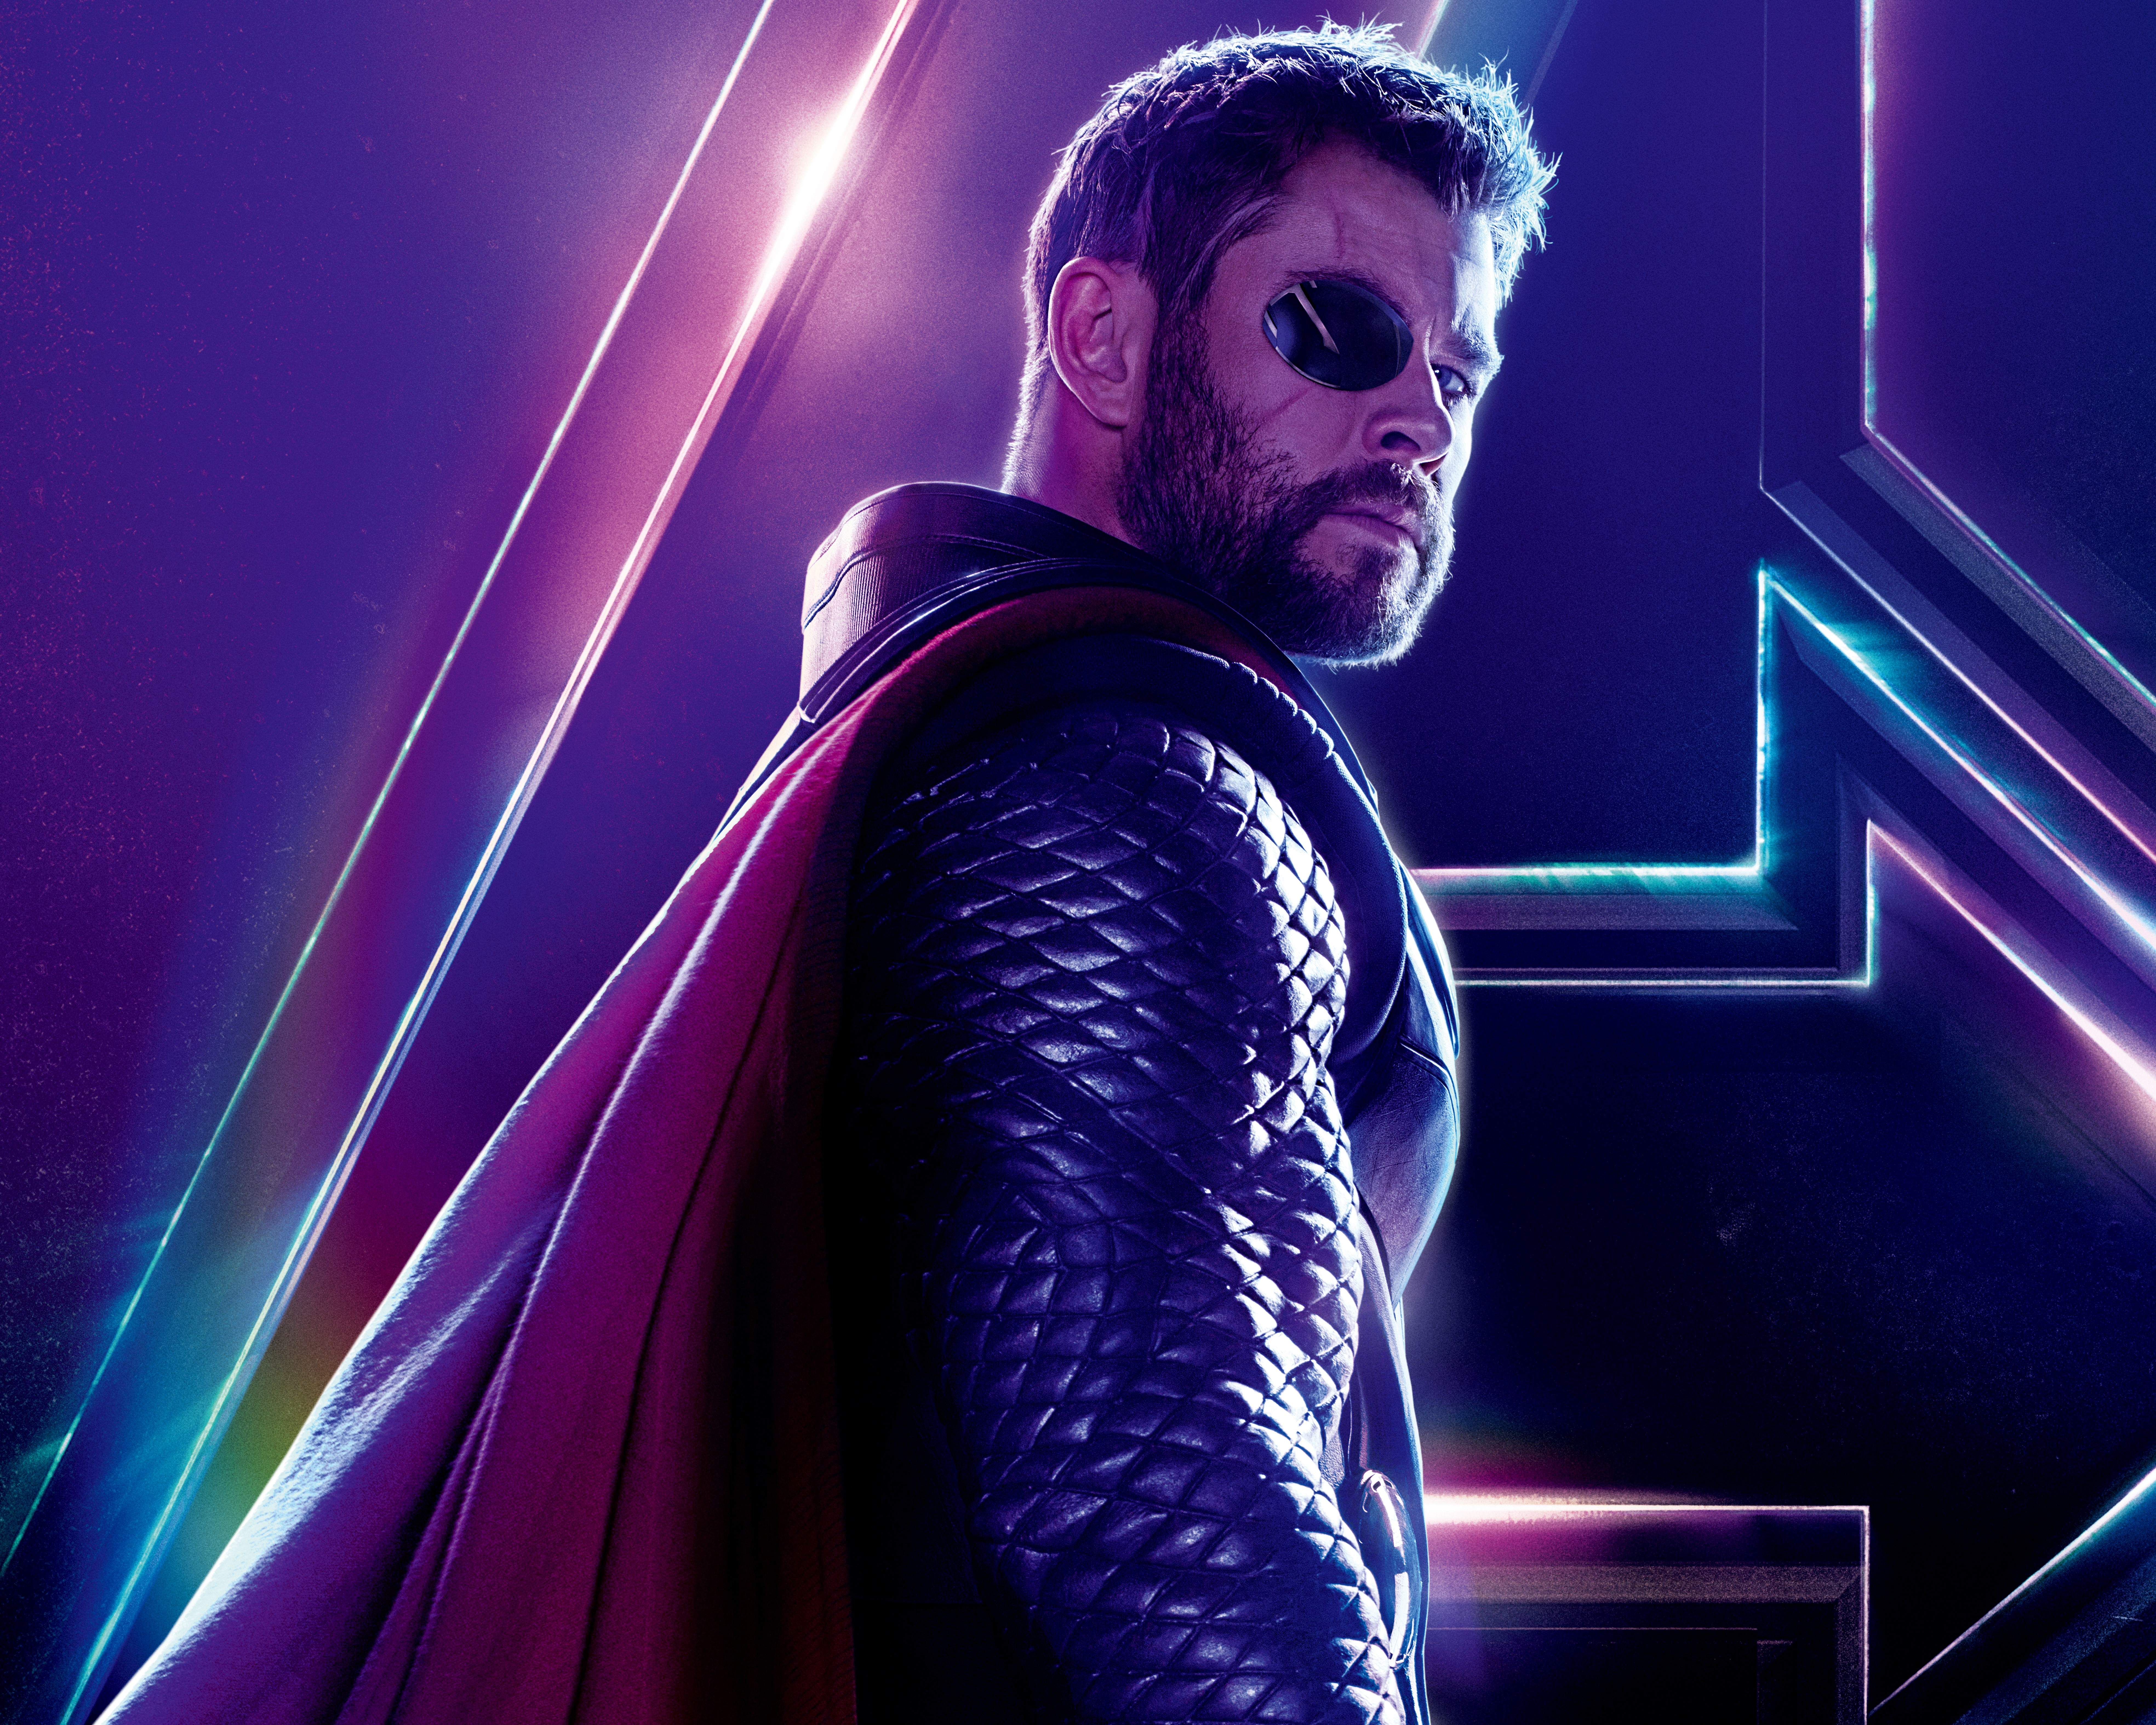 Thor Avengers Infinity War 8k Ultra Hd Wallpaper Background